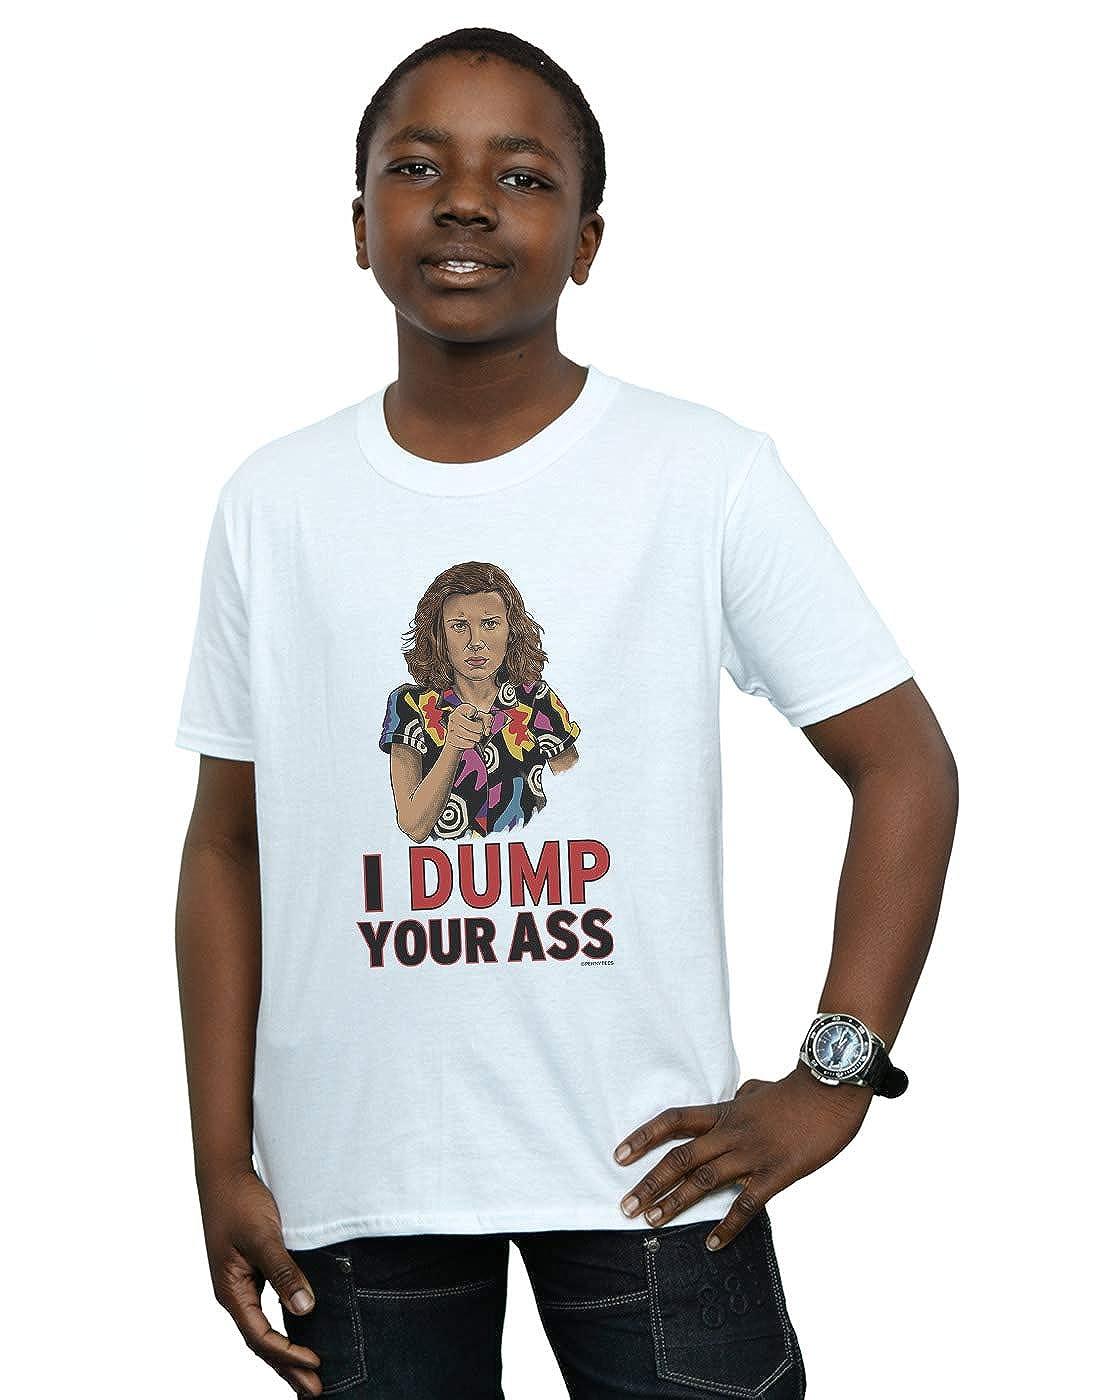 Pennytees Boys I Dump Your Ass T-Shirt